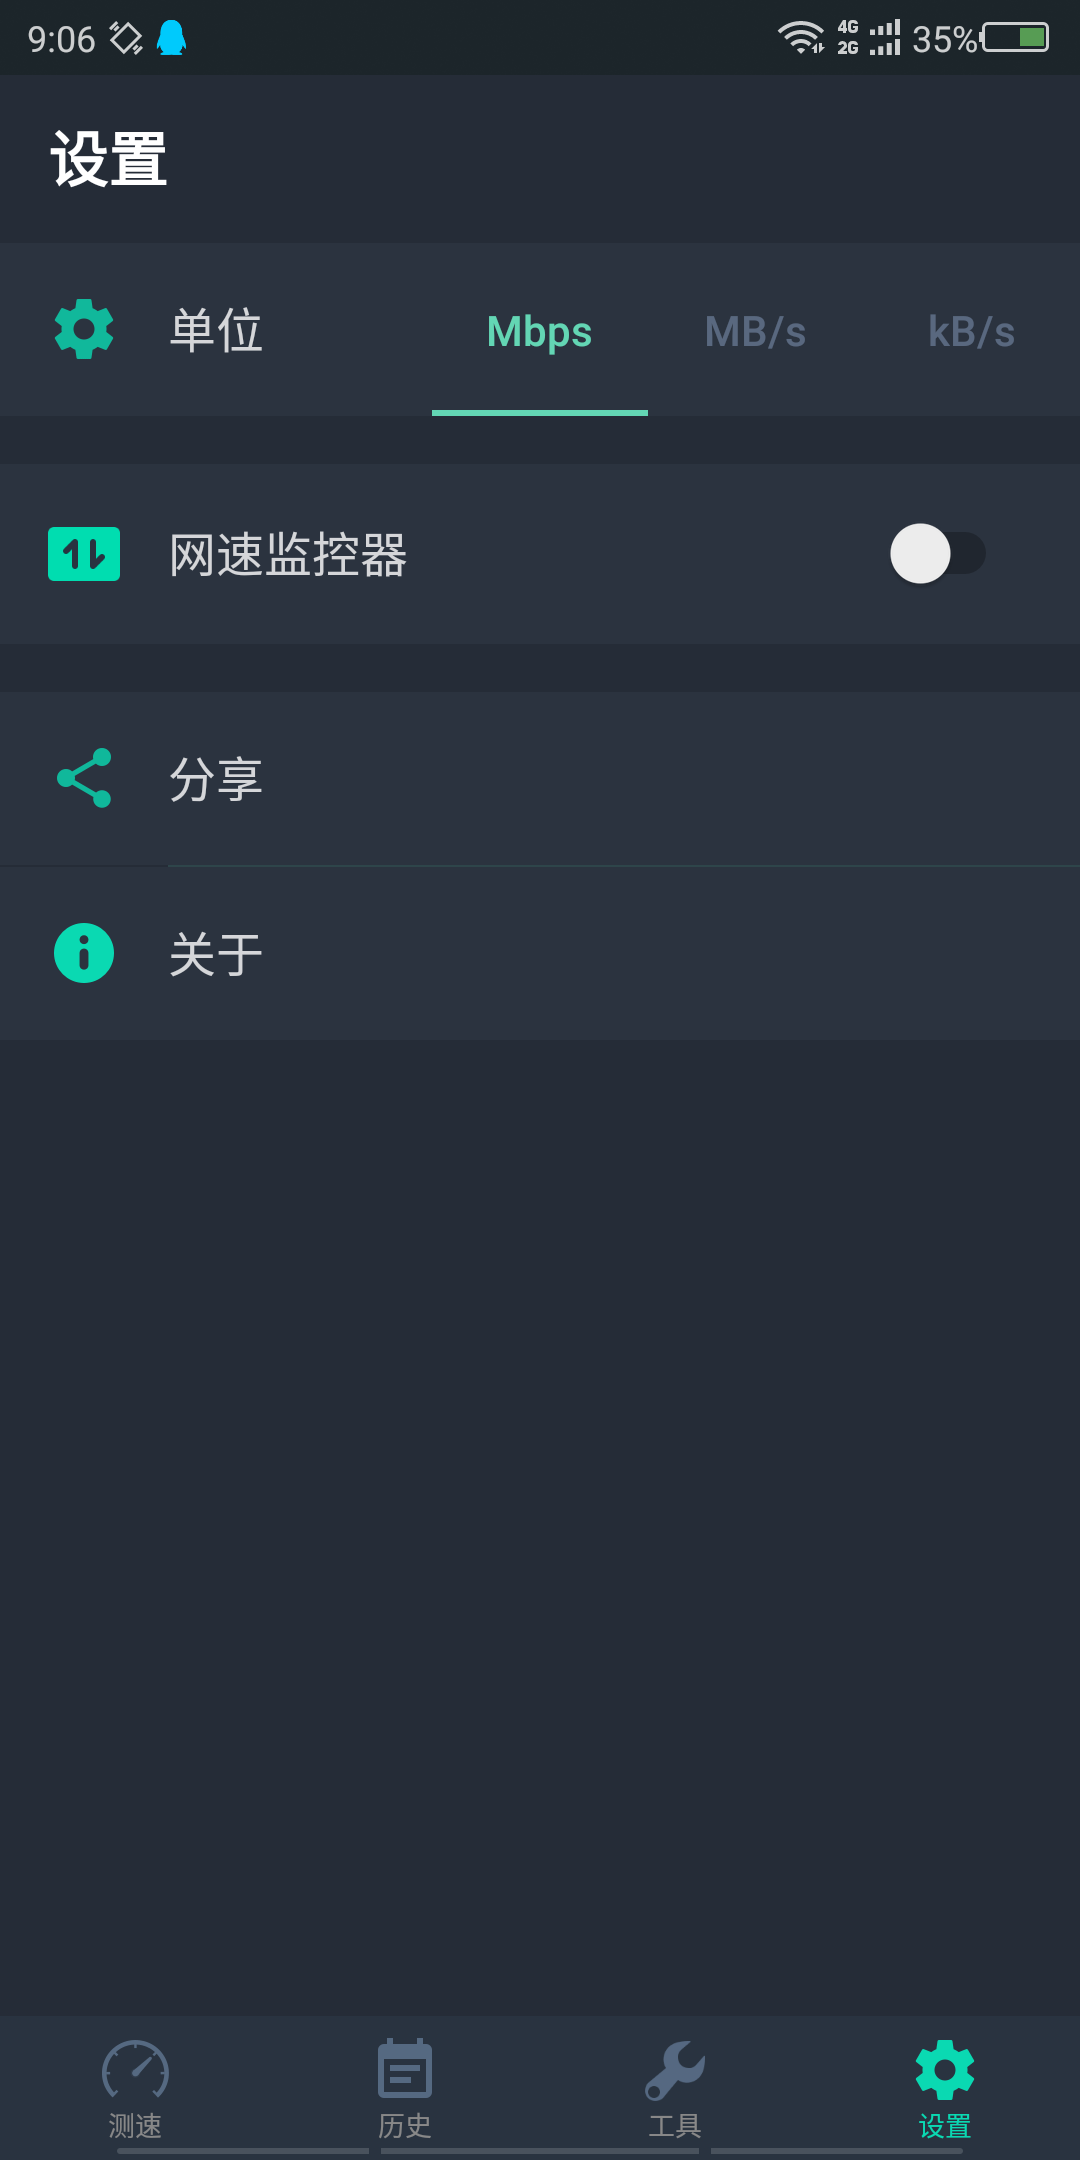 【考核】SpeedtestMaster应用软件